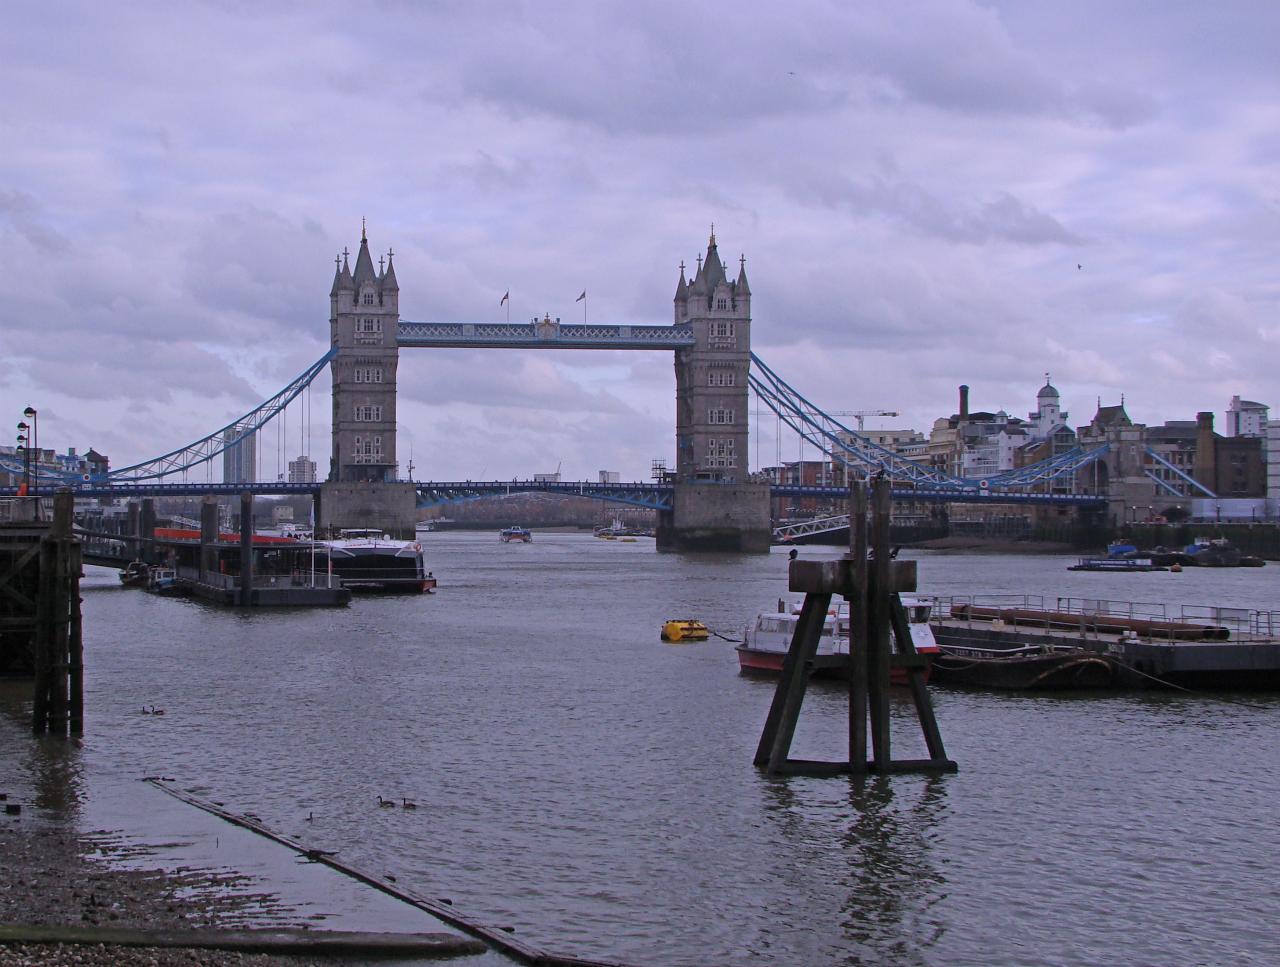 Tower Bridge, London, photographed on 24 February 2014